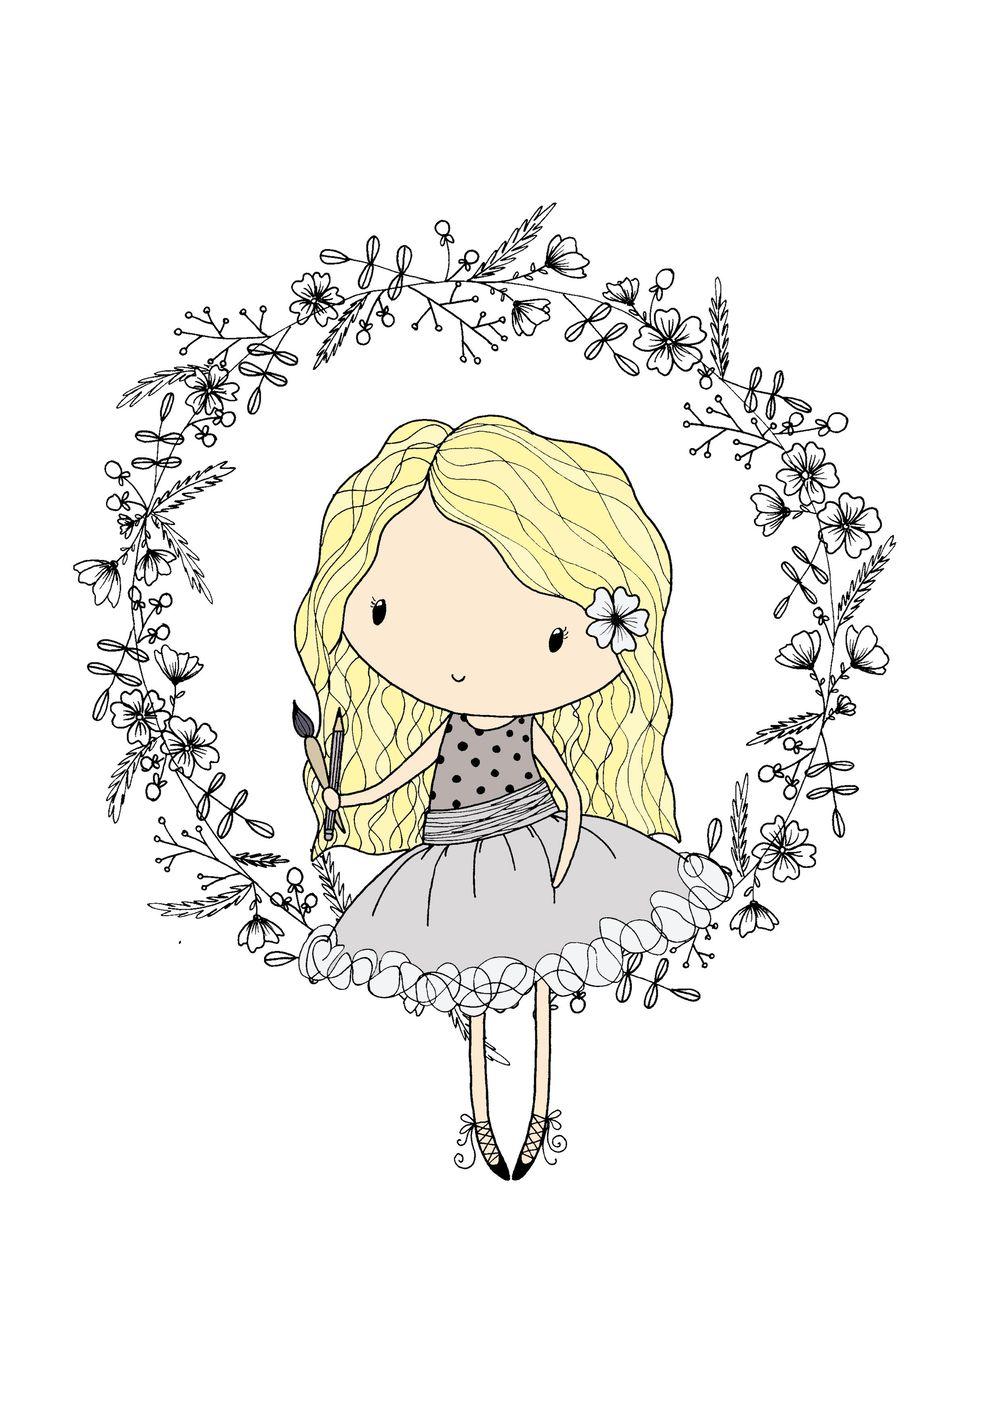 flower and leaf doodles - image 1 - student project